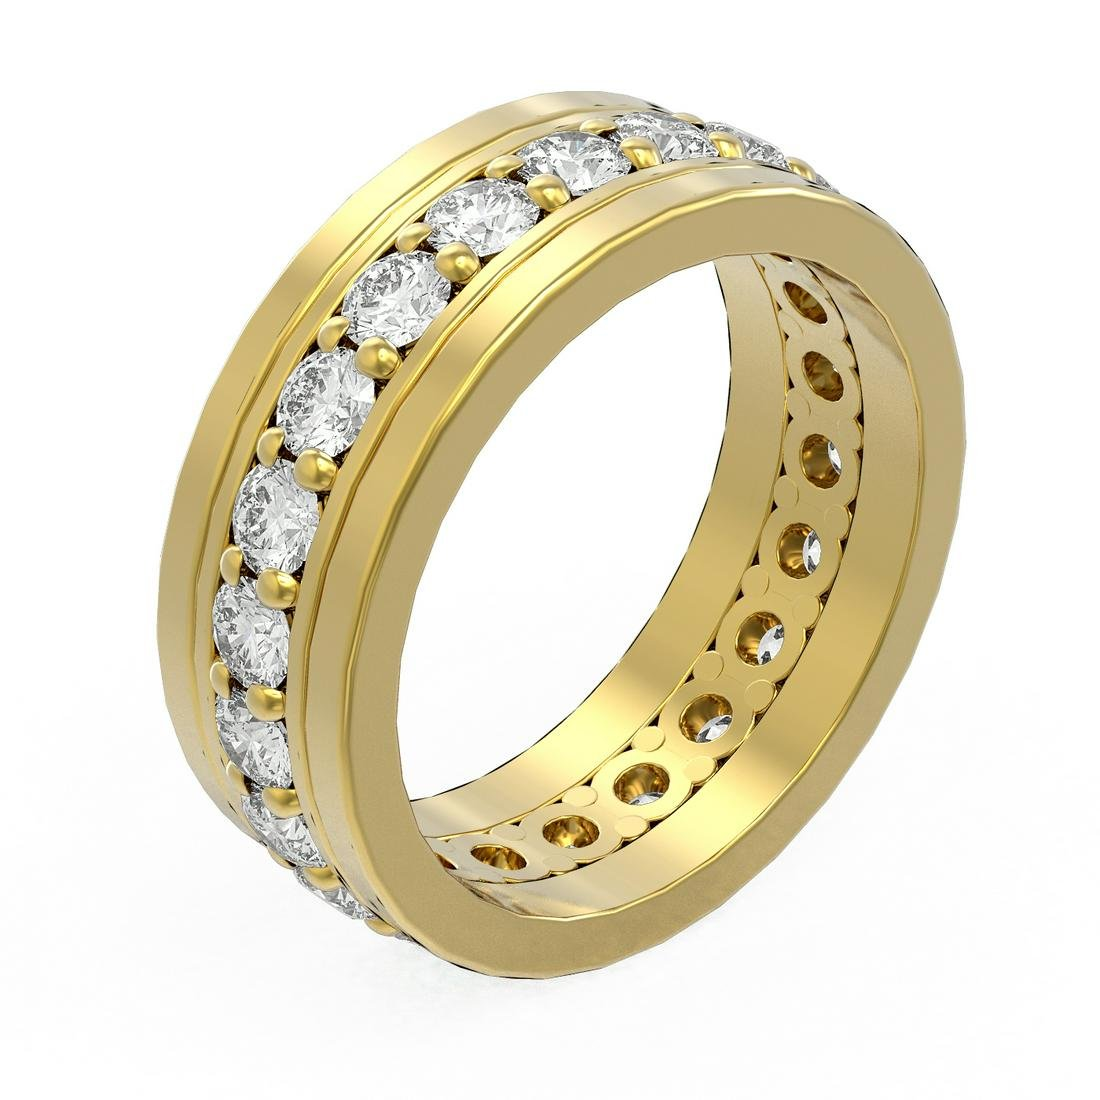 3.08 ctw Diamond Men's Ring 18K Yellow Gold -